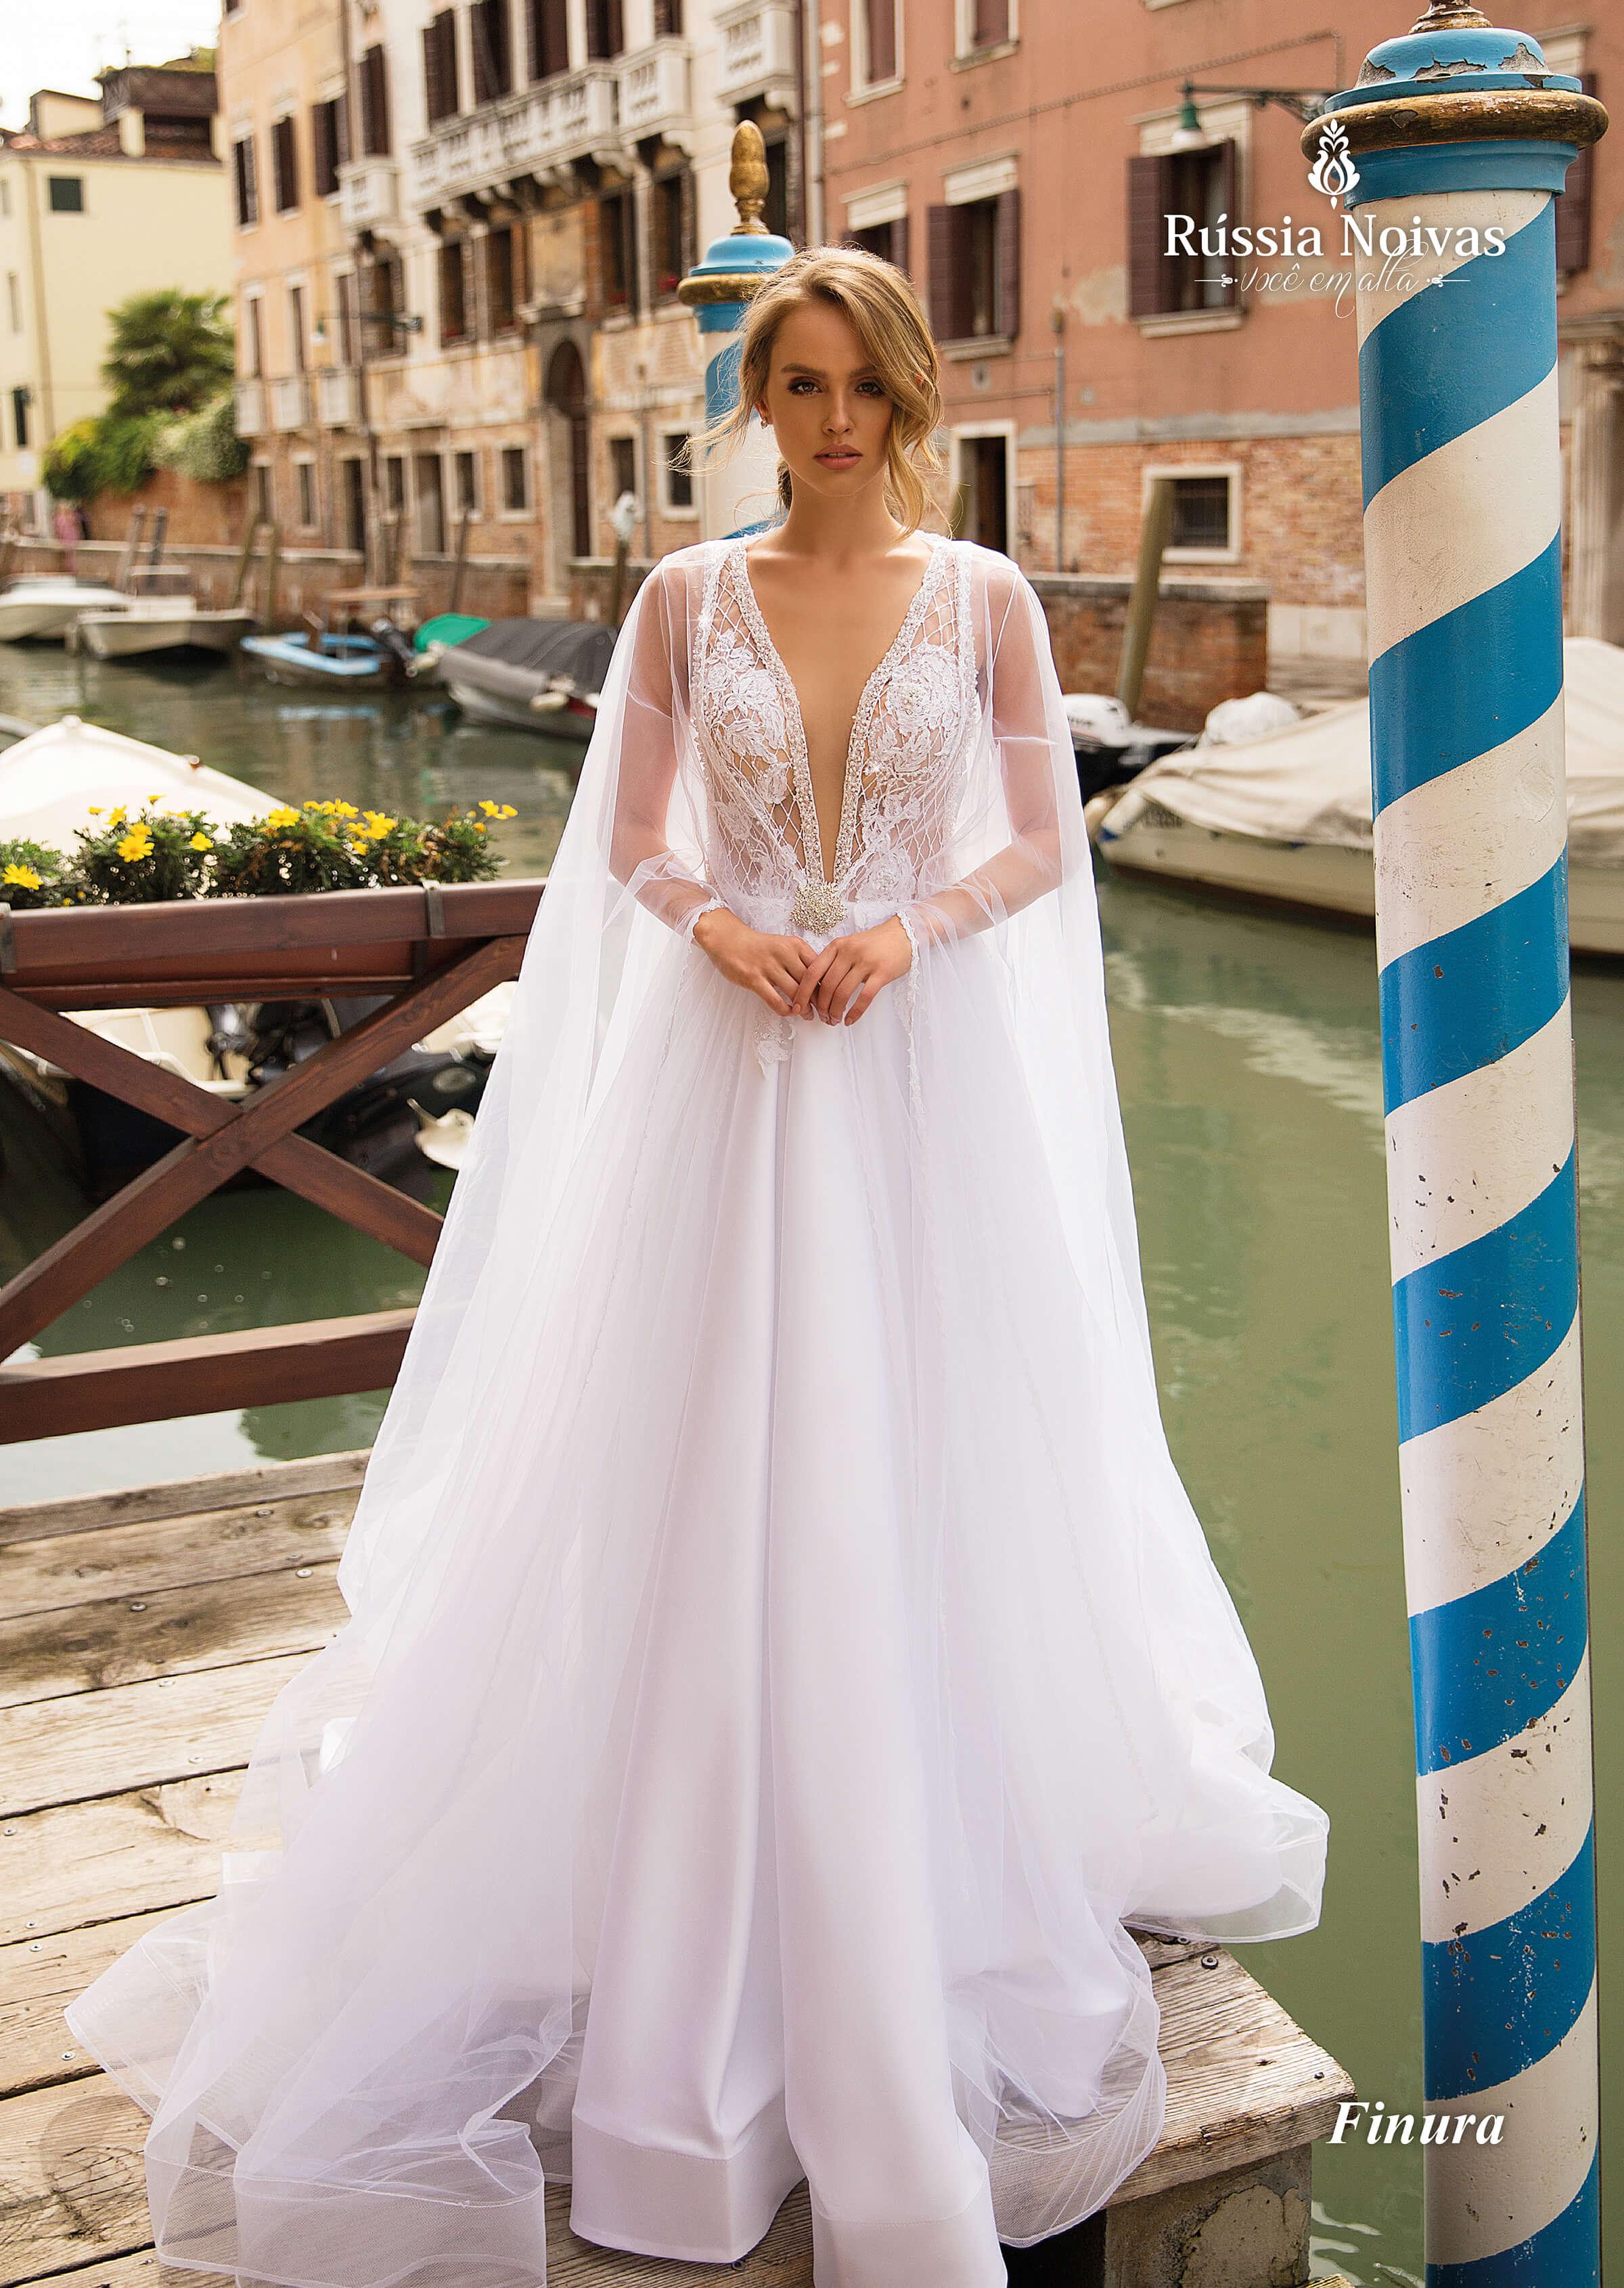 66bc6ff99 Inspire-se nos vestidos de noiva das celebridades